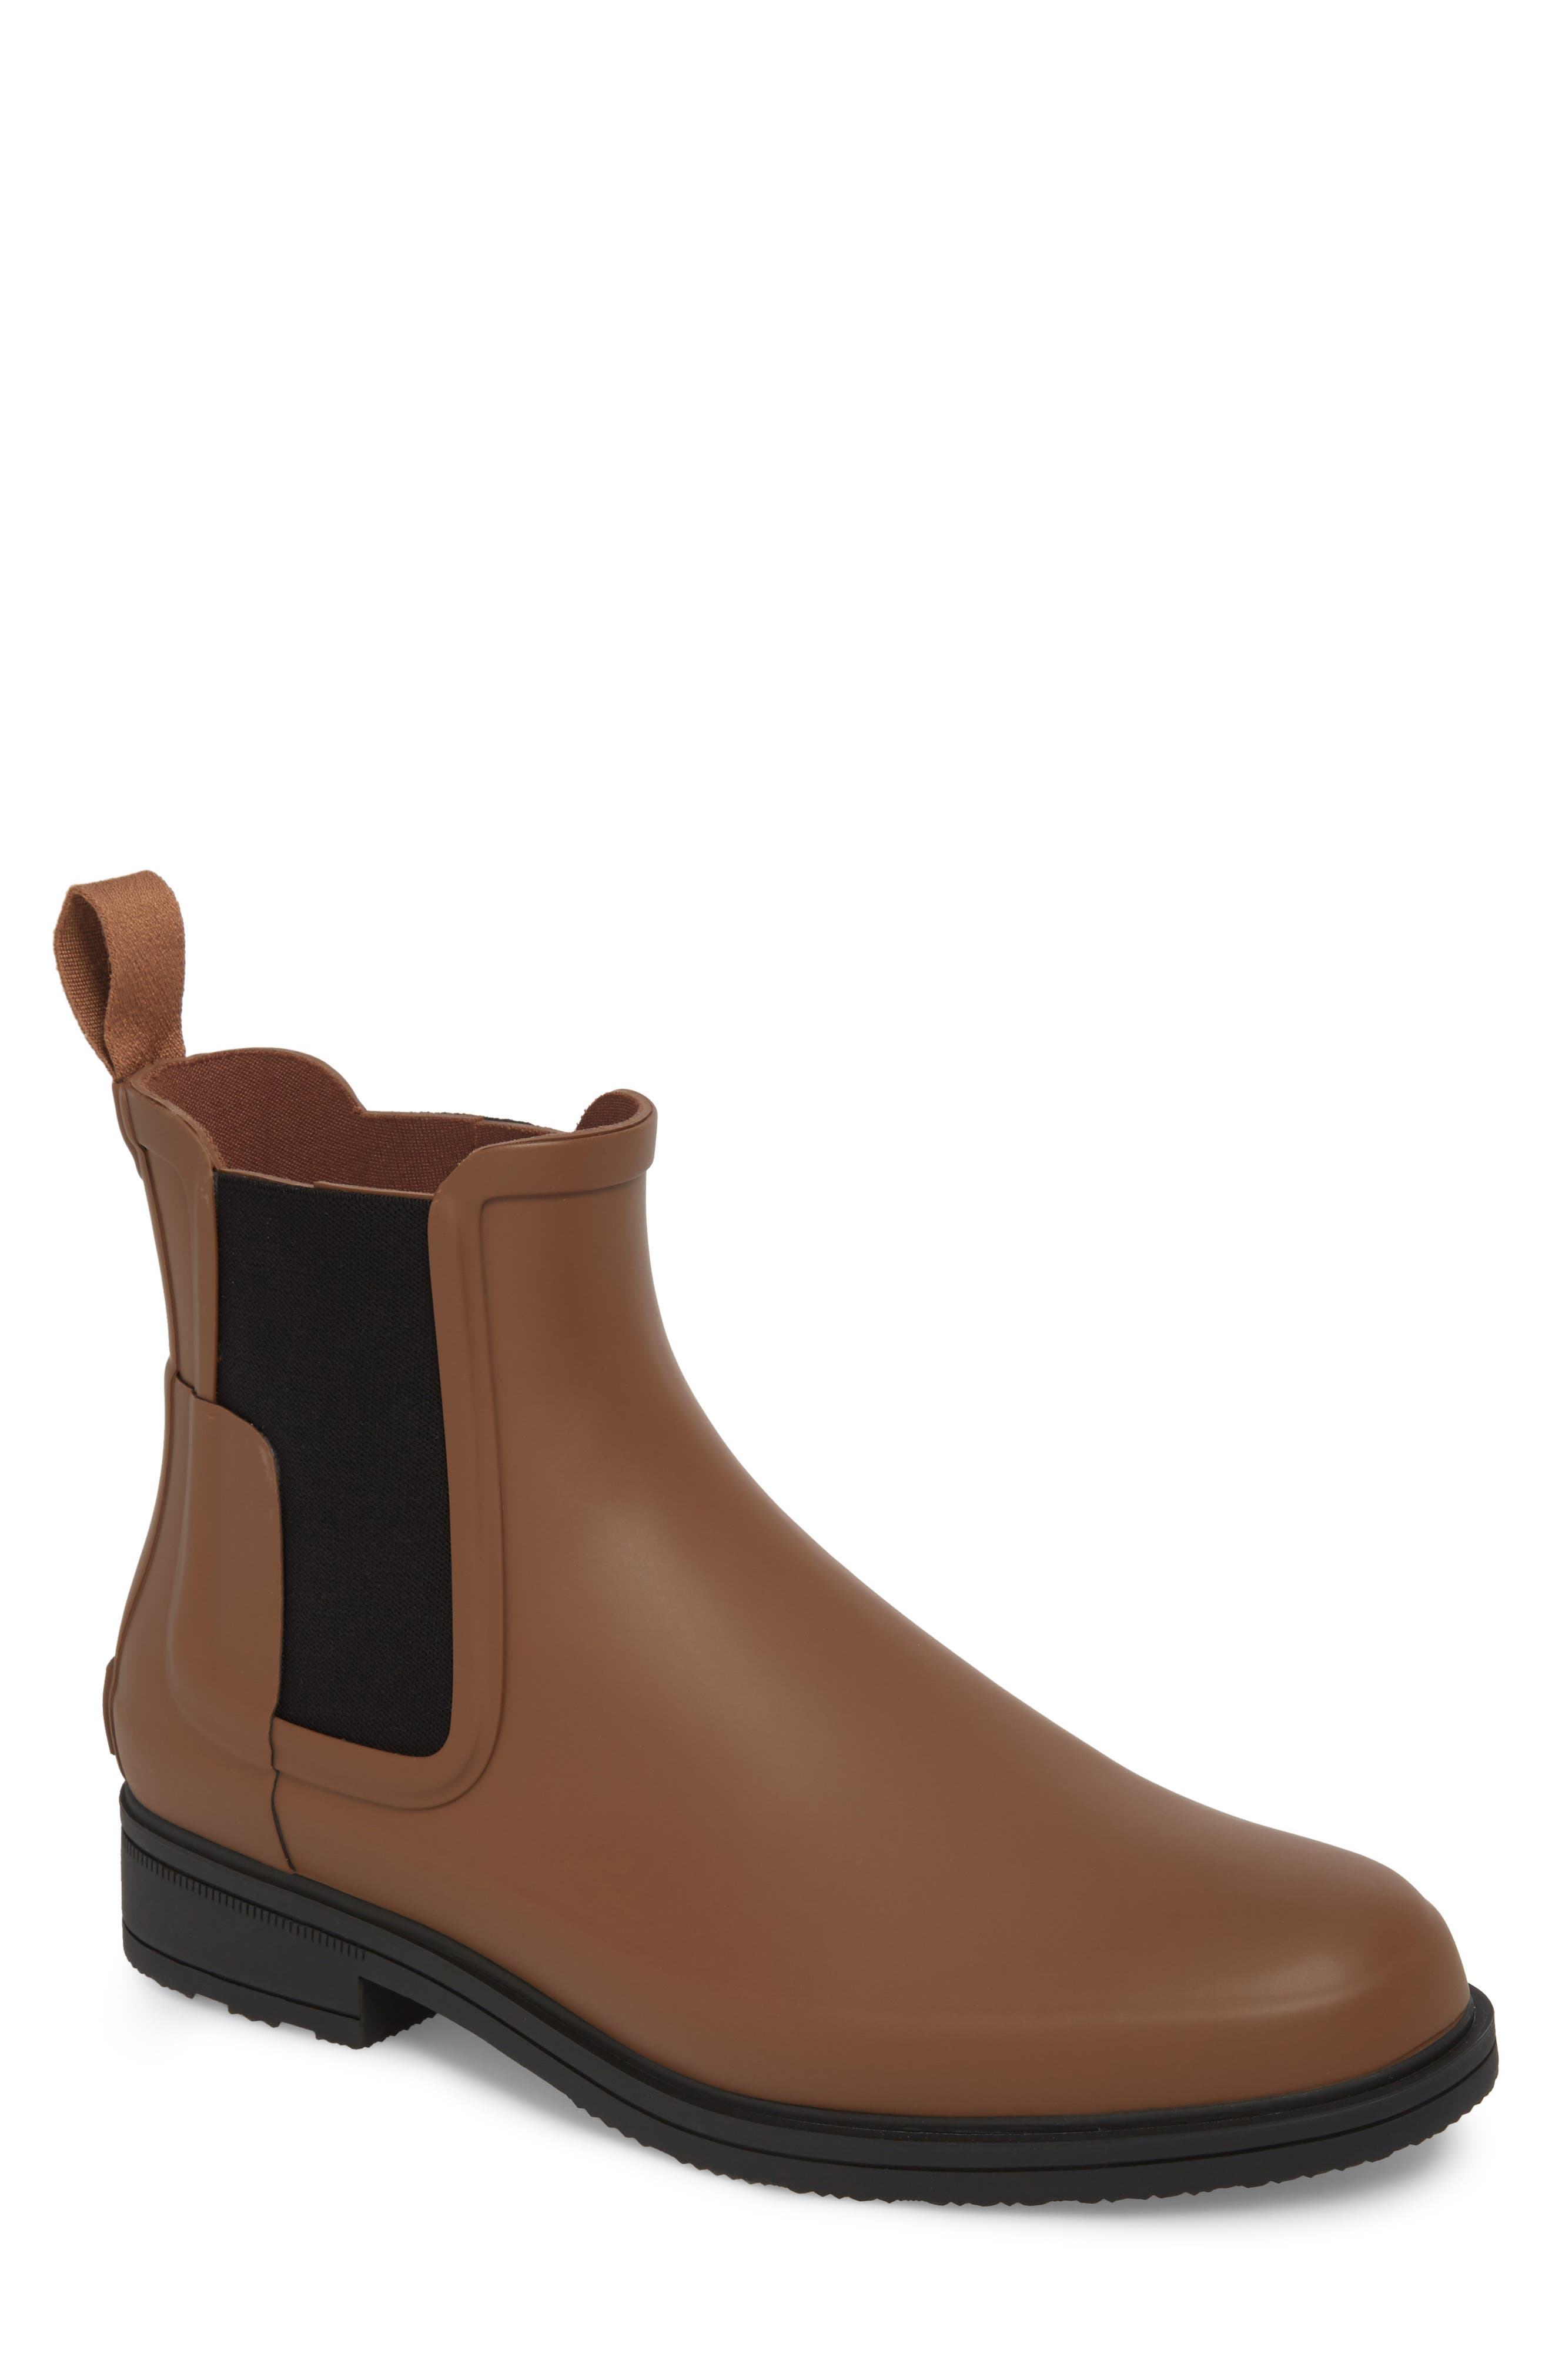 Alternate Image 1 Selected - Hunter Original Refined Waterproof Chelsea Boot (Men)